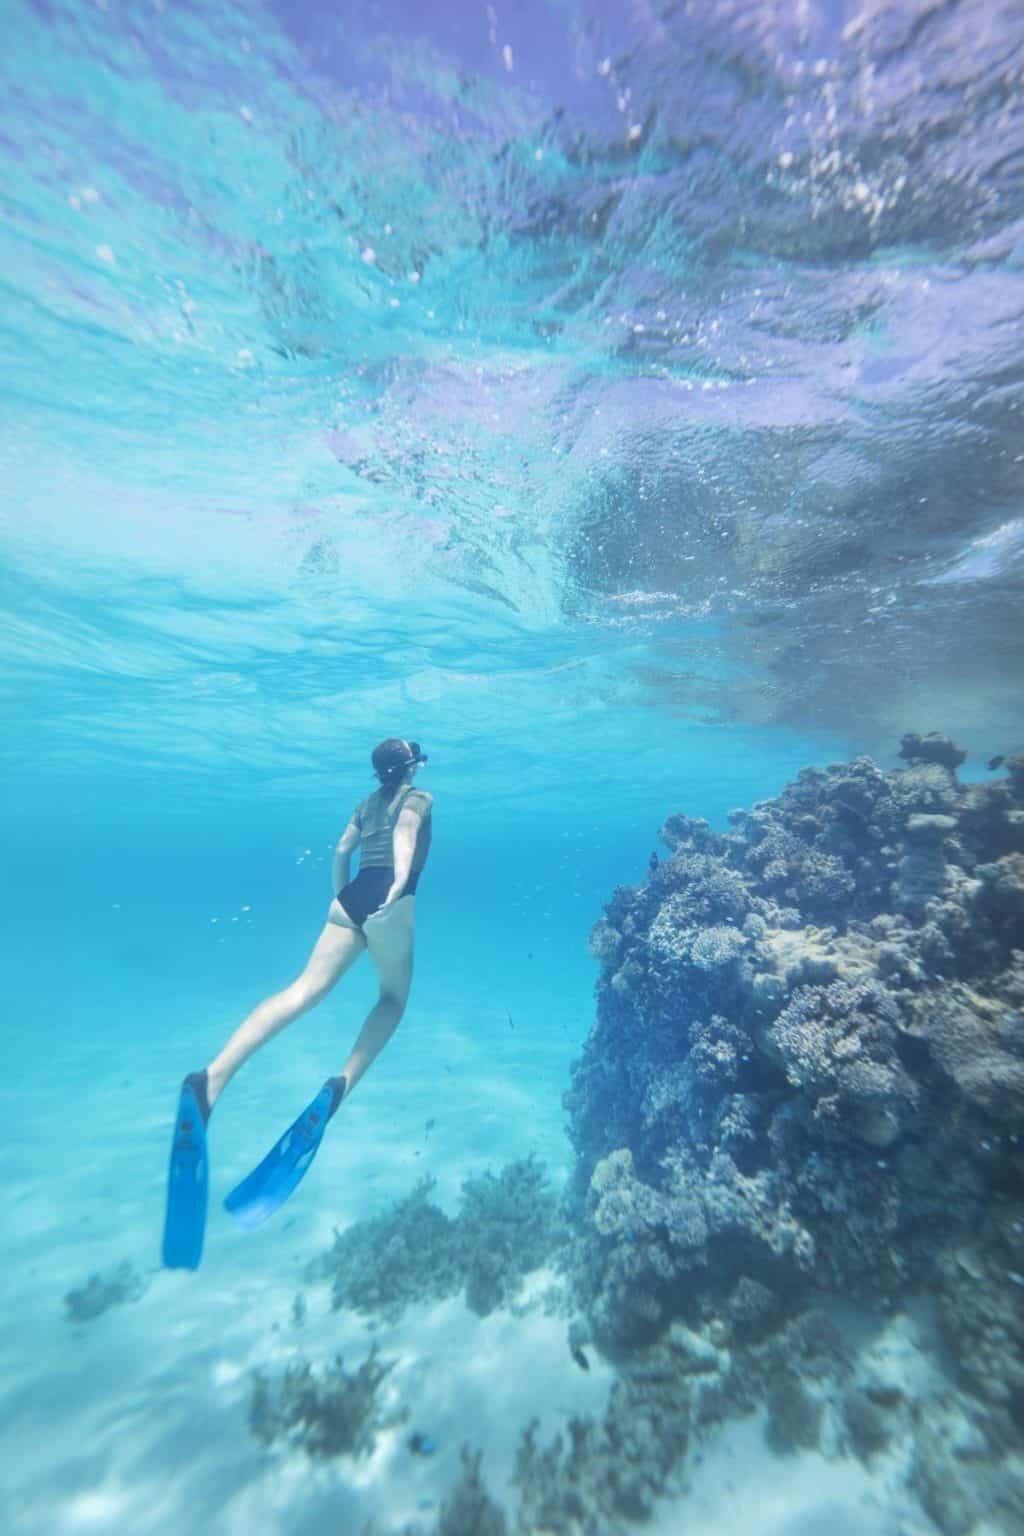 Cook Islands Underwater Photography, Aitutaki with Olympus Underwater Housing